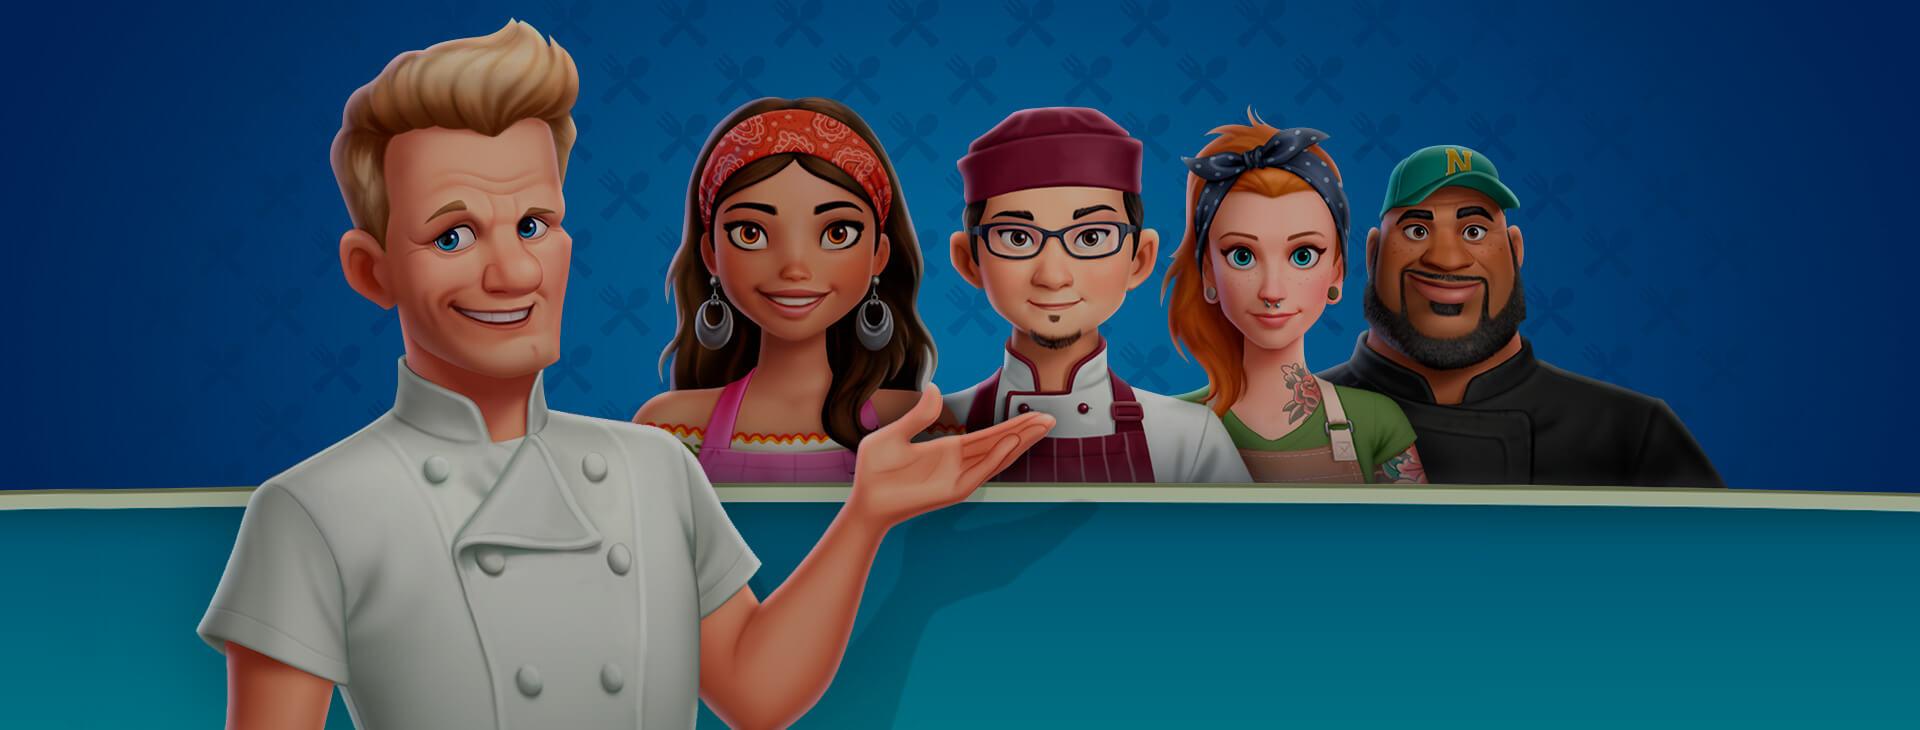 Gordon Ramsay: Chef Blast - Brand Content & Social Media Ads